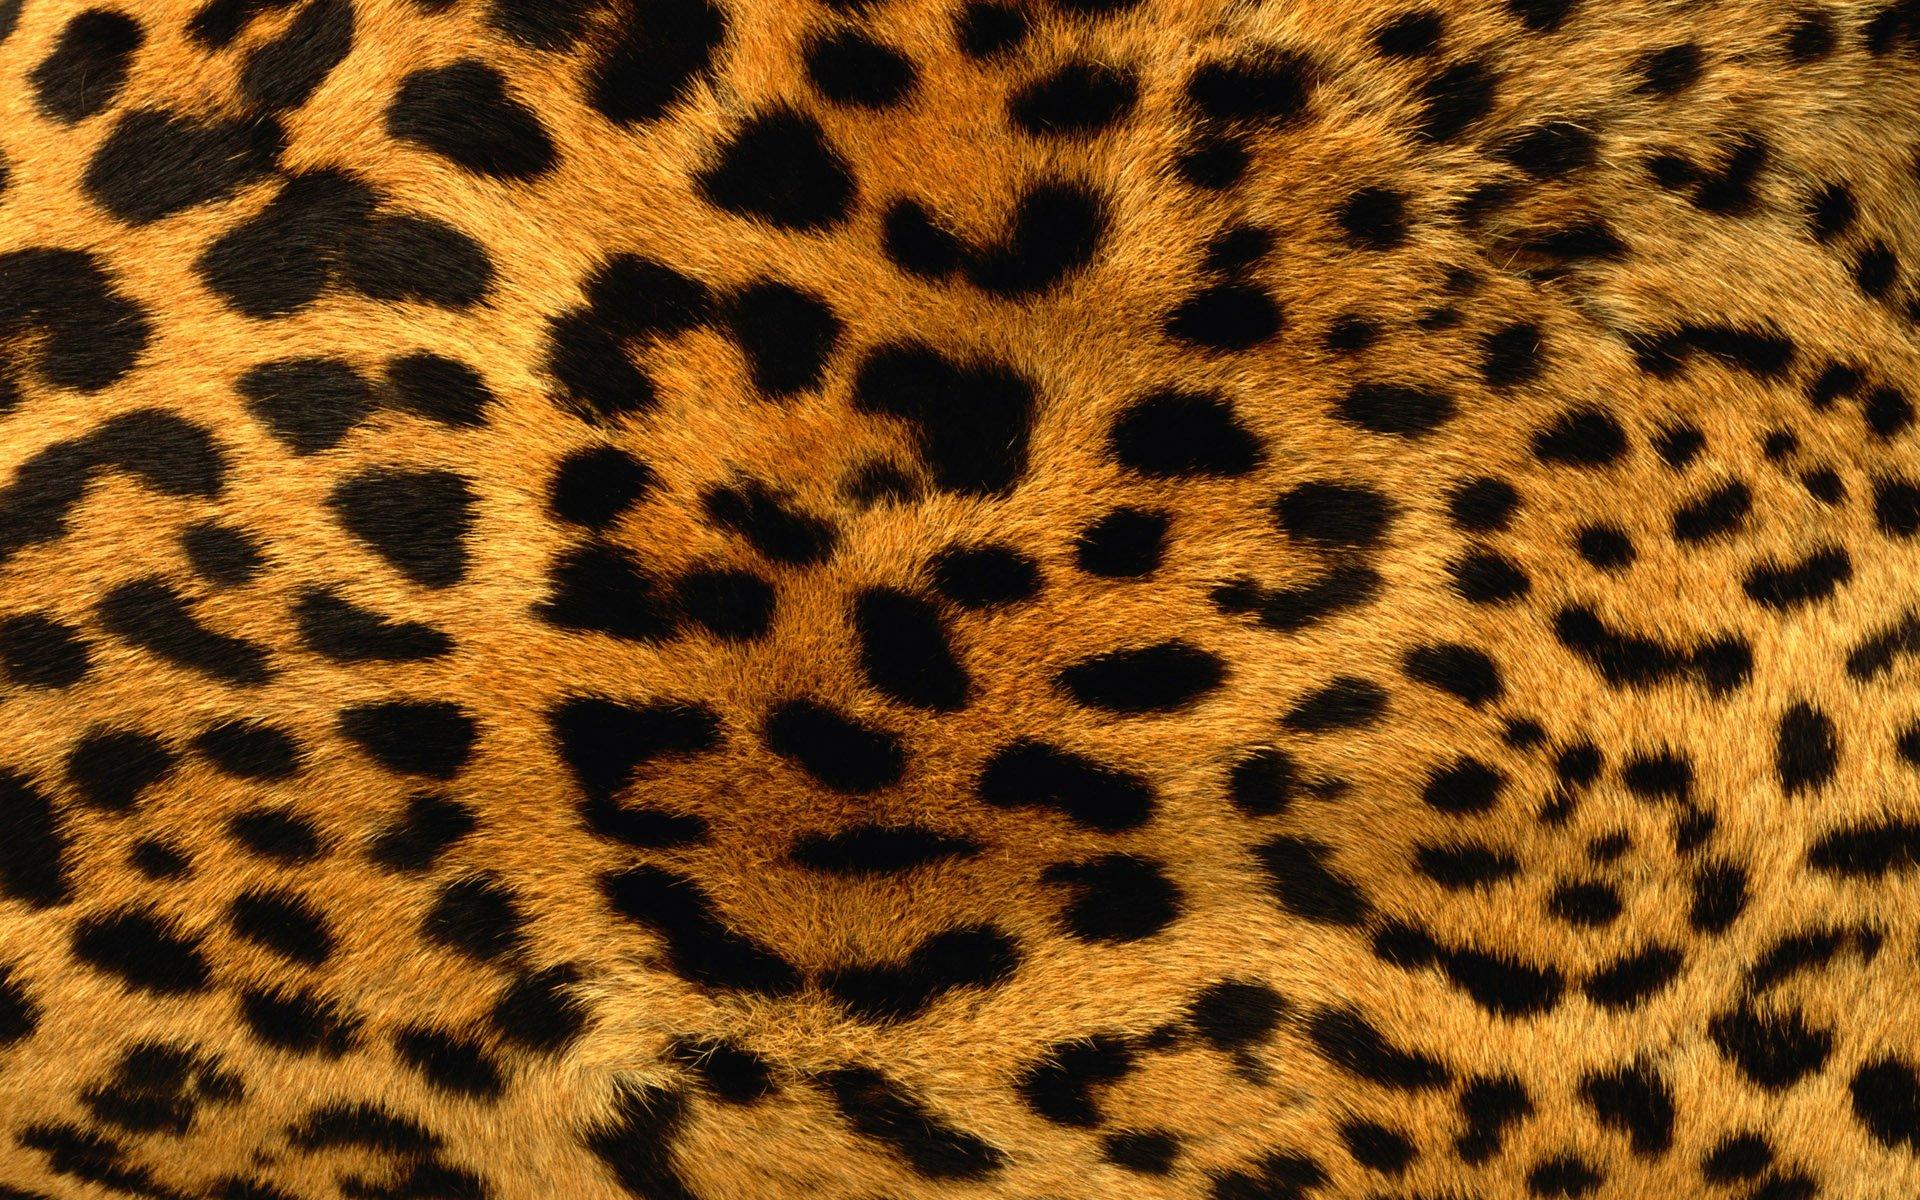 Fondos de pantalla Textura piel de leopardo